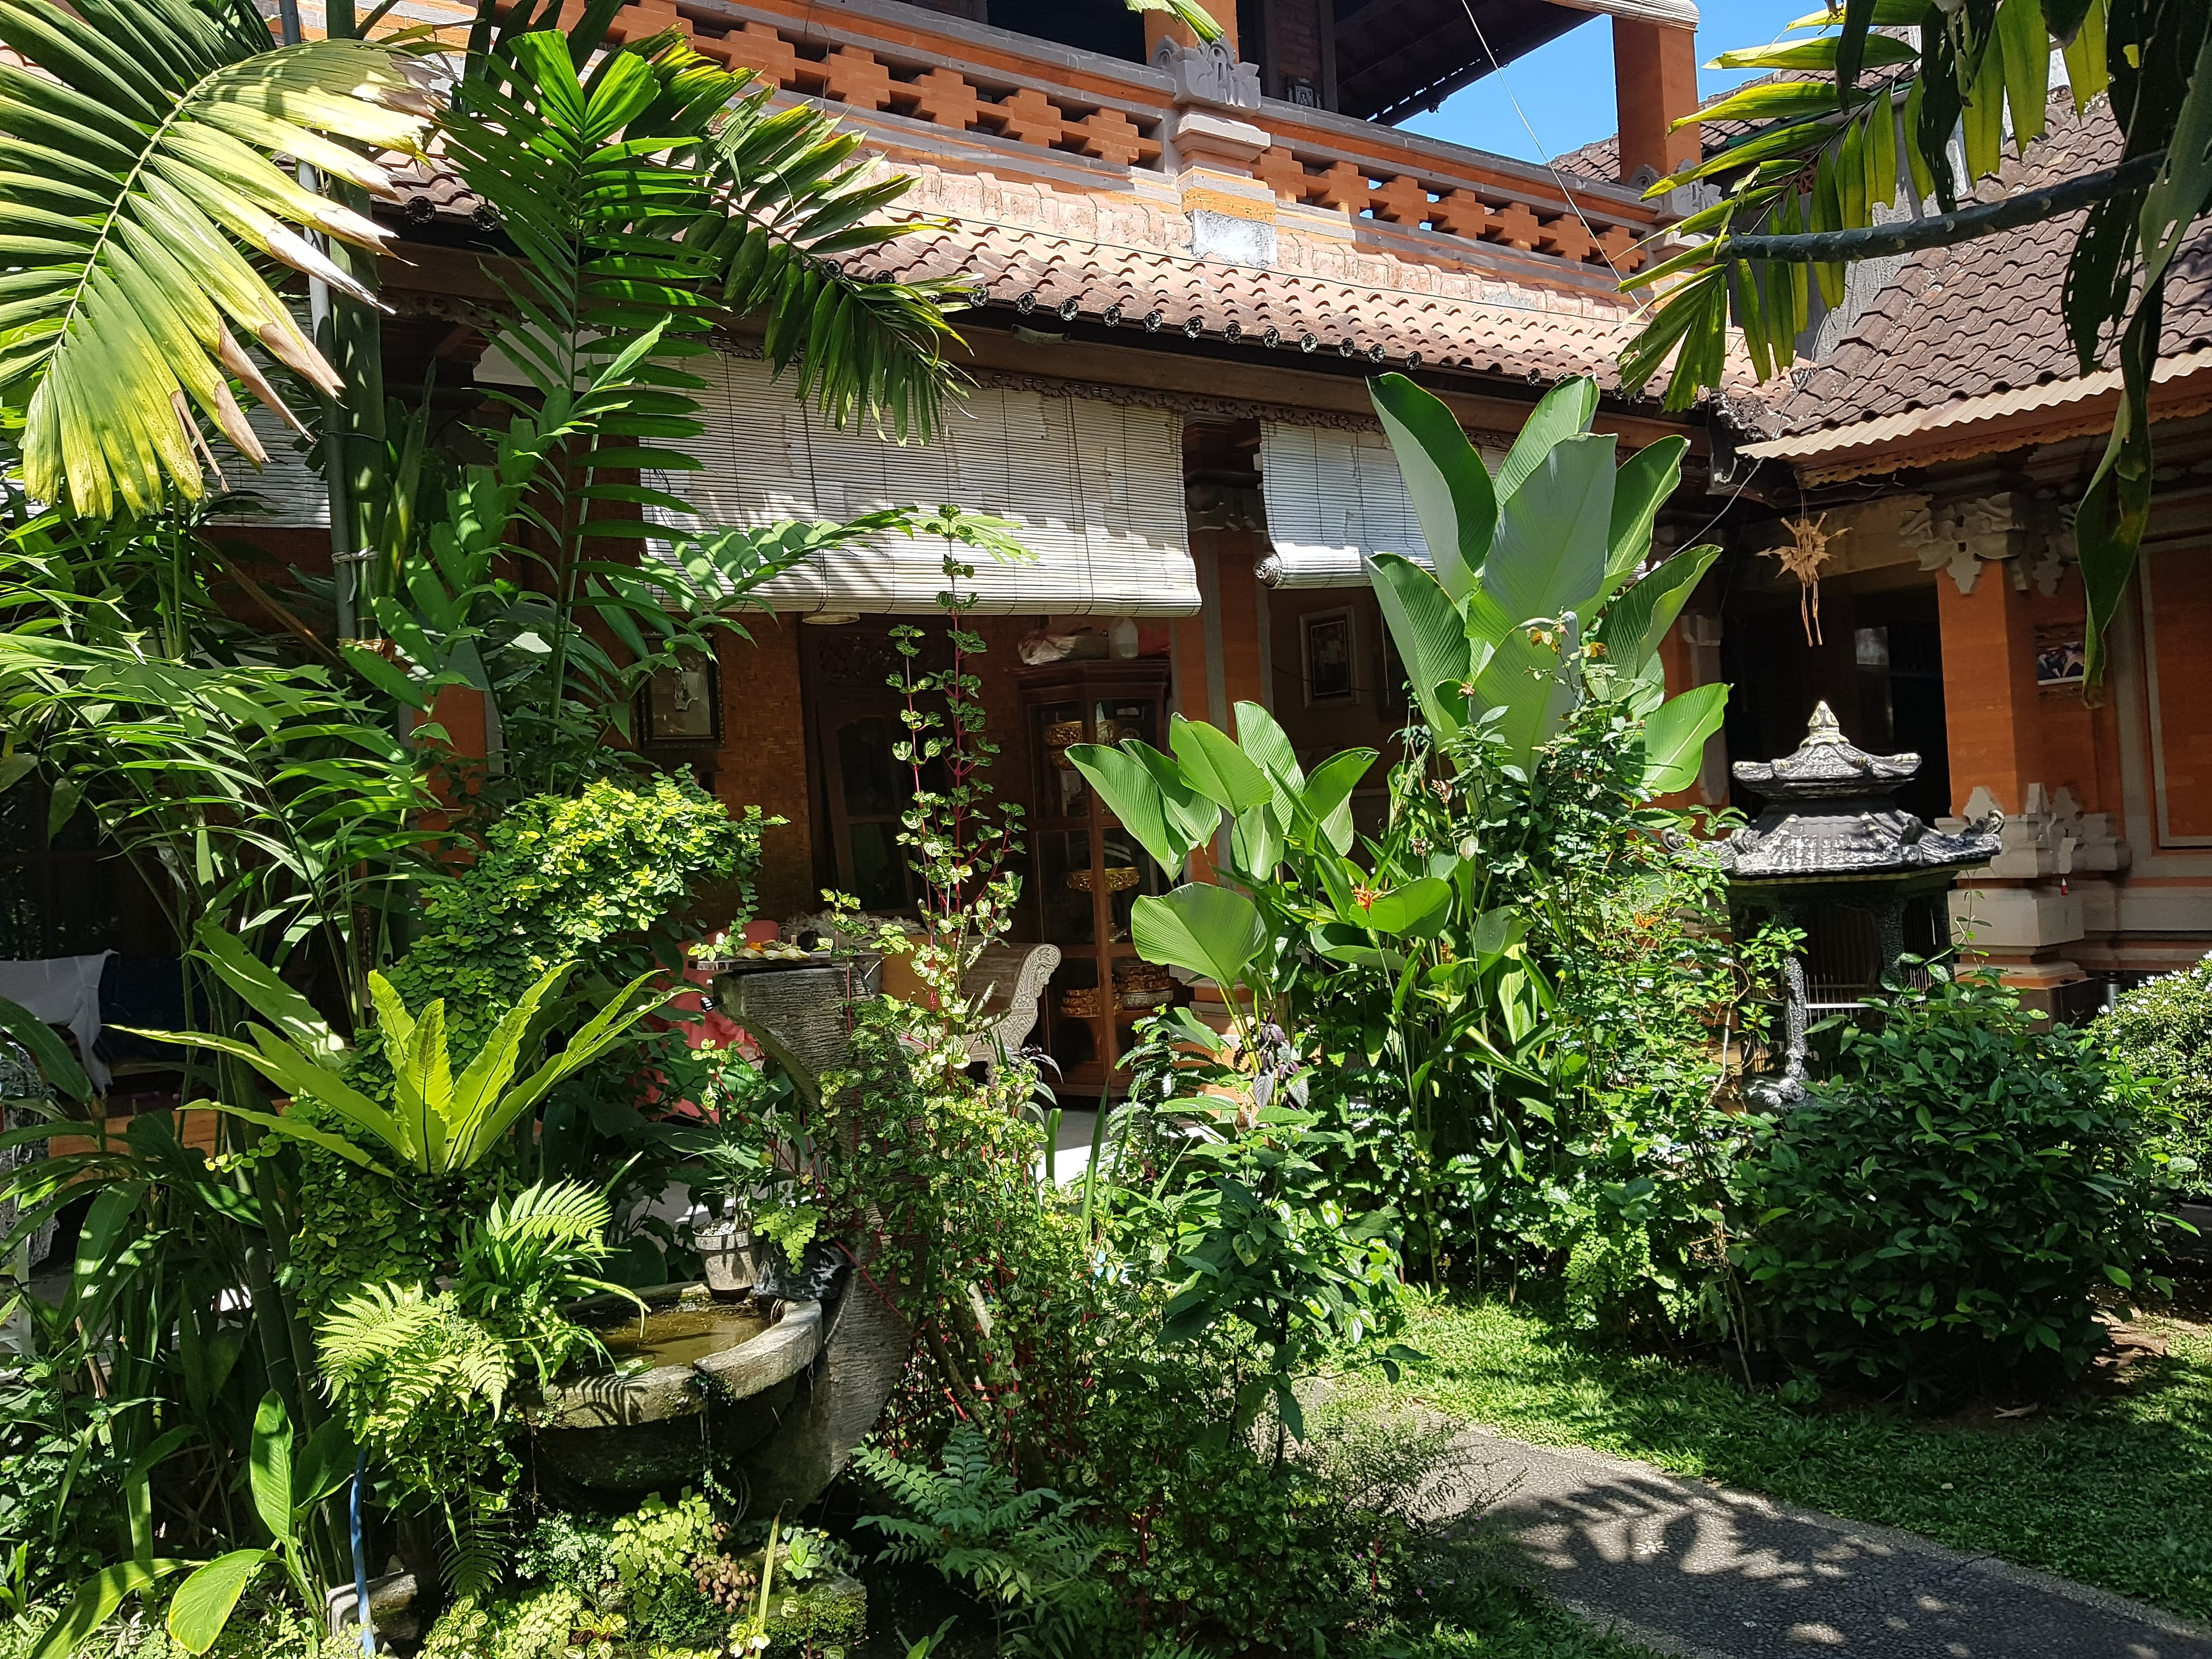 HOSTEL - Bimamuka 2 House